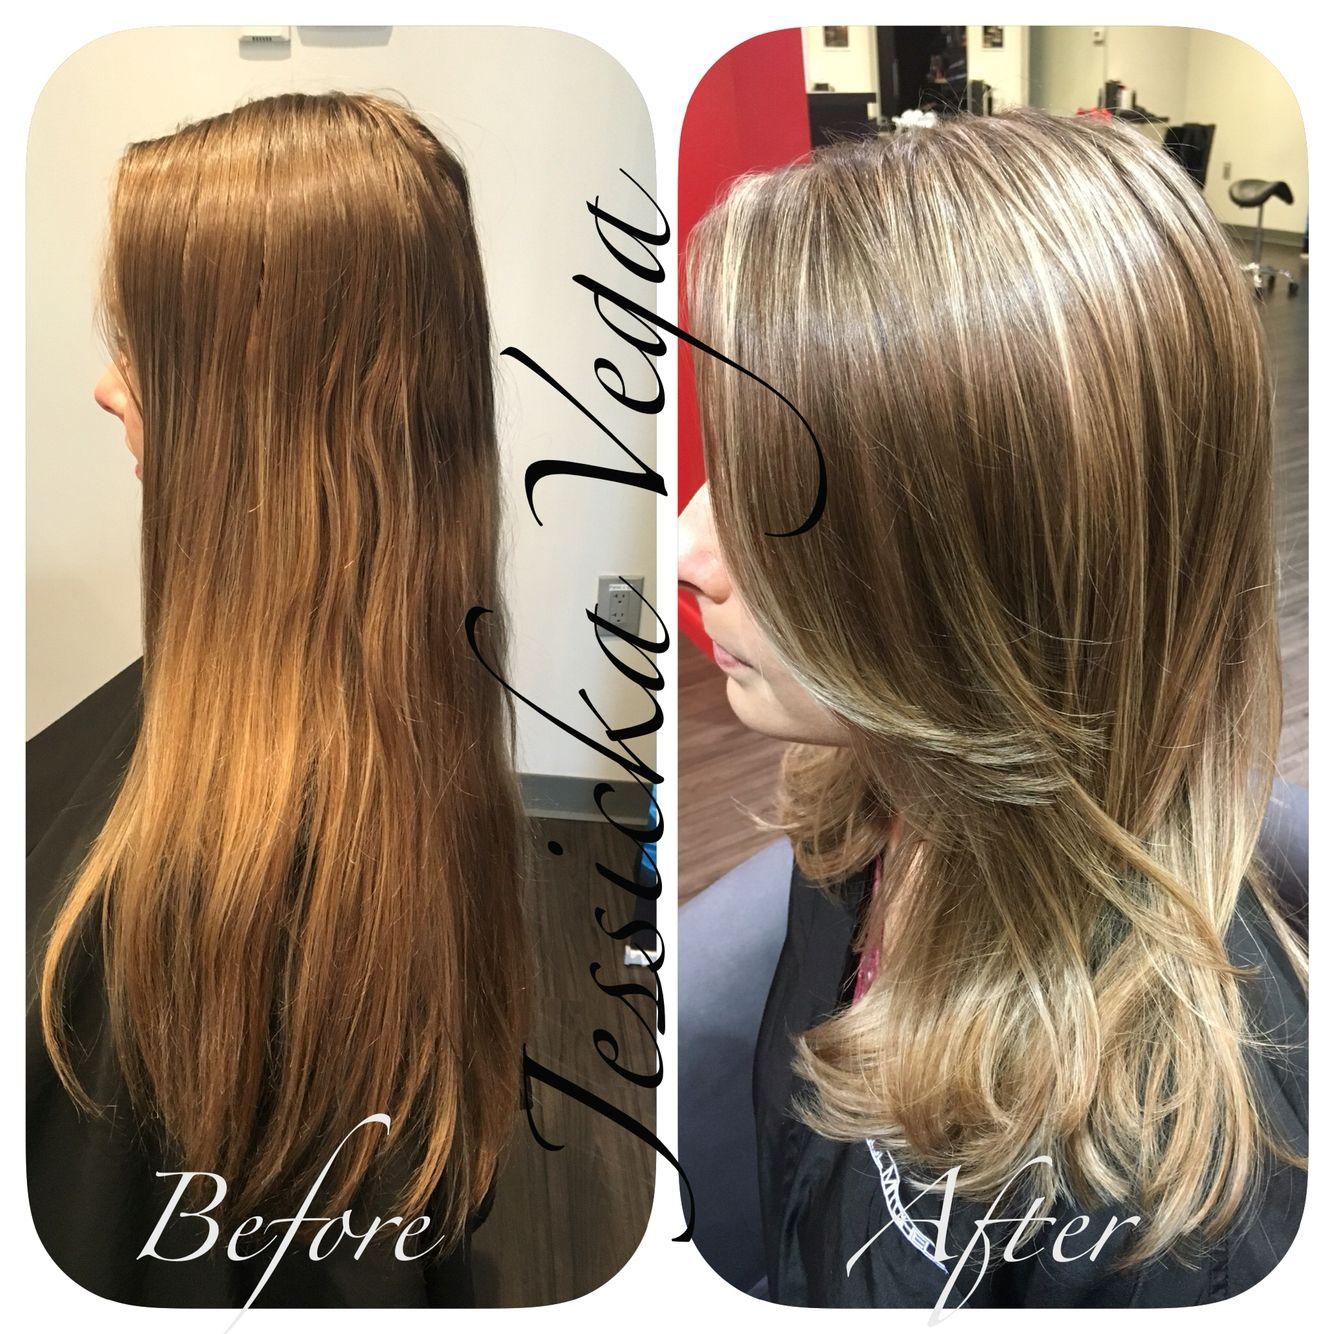 #Hair #Hairstyle #Fashion #Hairoftheday #Haircut #Hairstylist #Haircolor #Hairstyles #Hairdresser #Hairfashion #Hairlife #Likesforlikes #Hairdown #Instahaircolor #Likesreturned #Hairup #Hairideas #Hairs #Hairofinstagram #Hairsalon #Haircare  #Hairpost #Hairdressing #Hairdone #Hairaccessories #Instahair #modernsalon